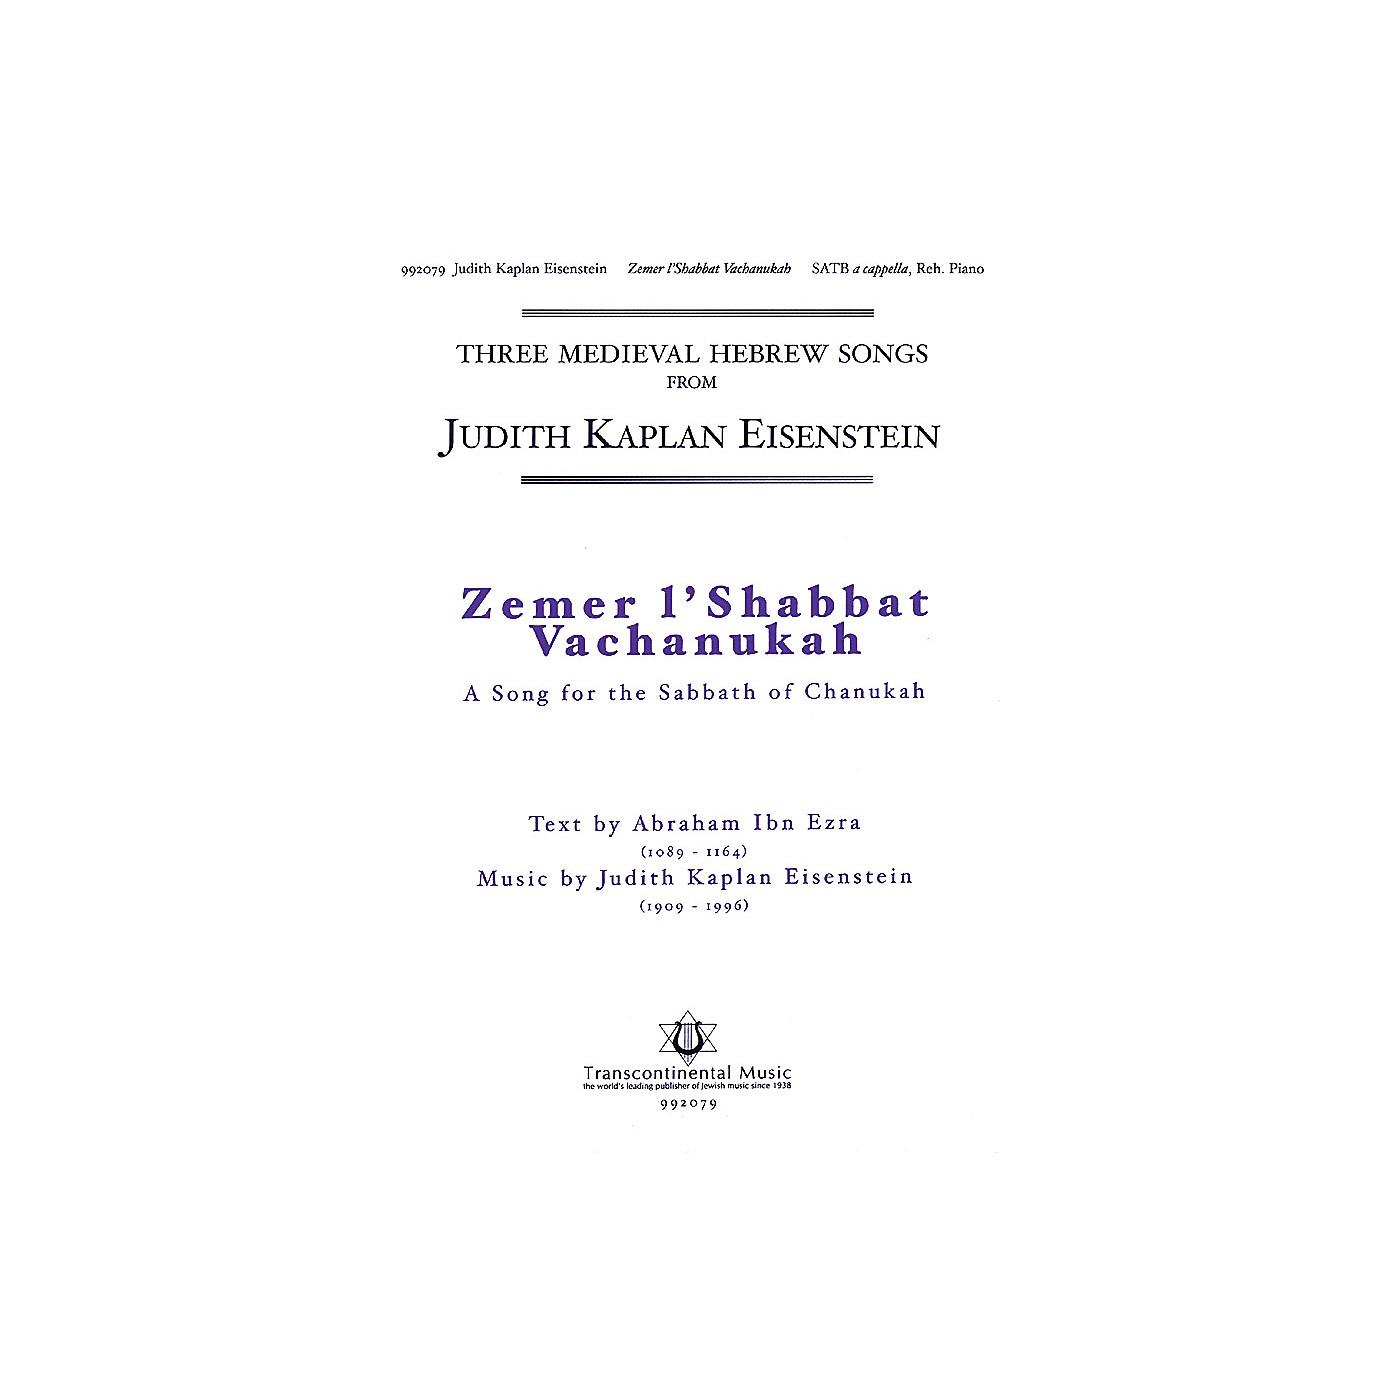 Transcontinental Music Zemer L'shabbat Vachanukah (A Song for the Sabbath of Chanukah) SATB a cappella by Judith Kaplan Eisenstein thumbnail